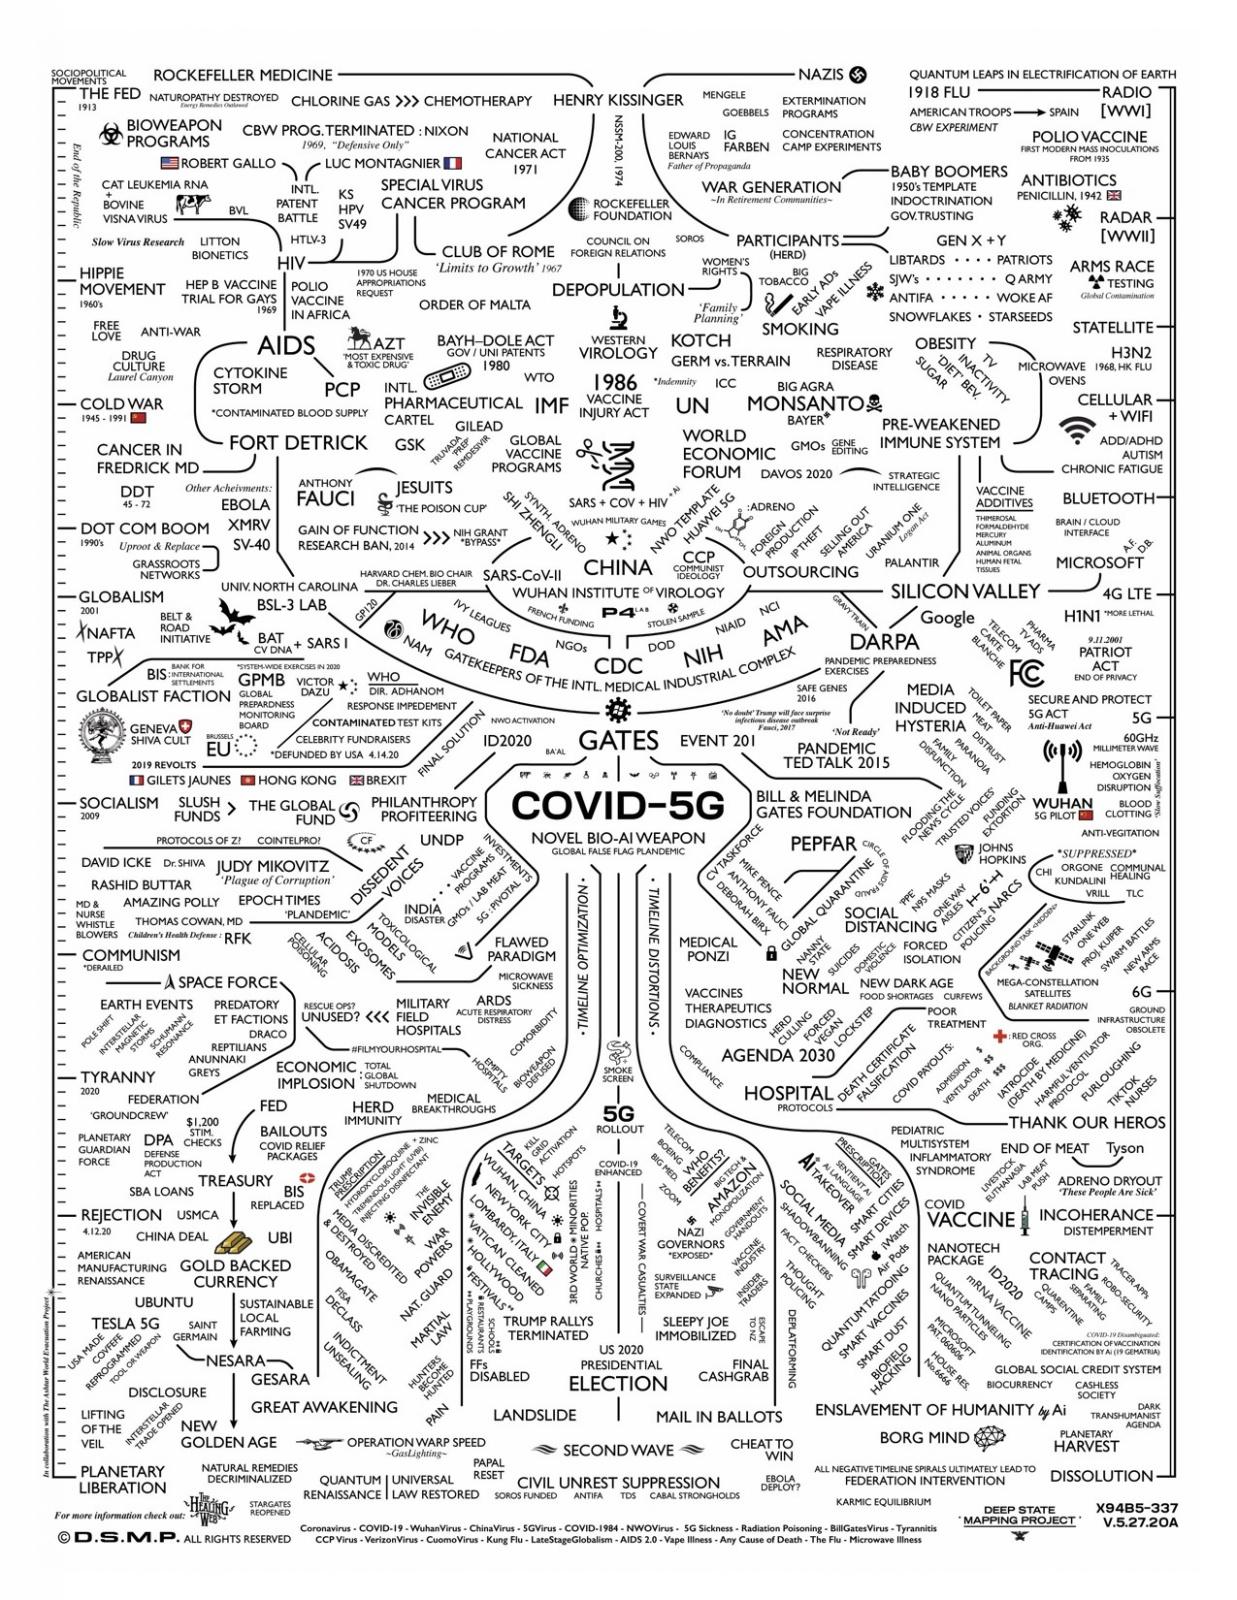 COVID-MAP-5.27A-1.thumb.jpg.0464d421c091c24cd4bdeed7010bdc77.jpg